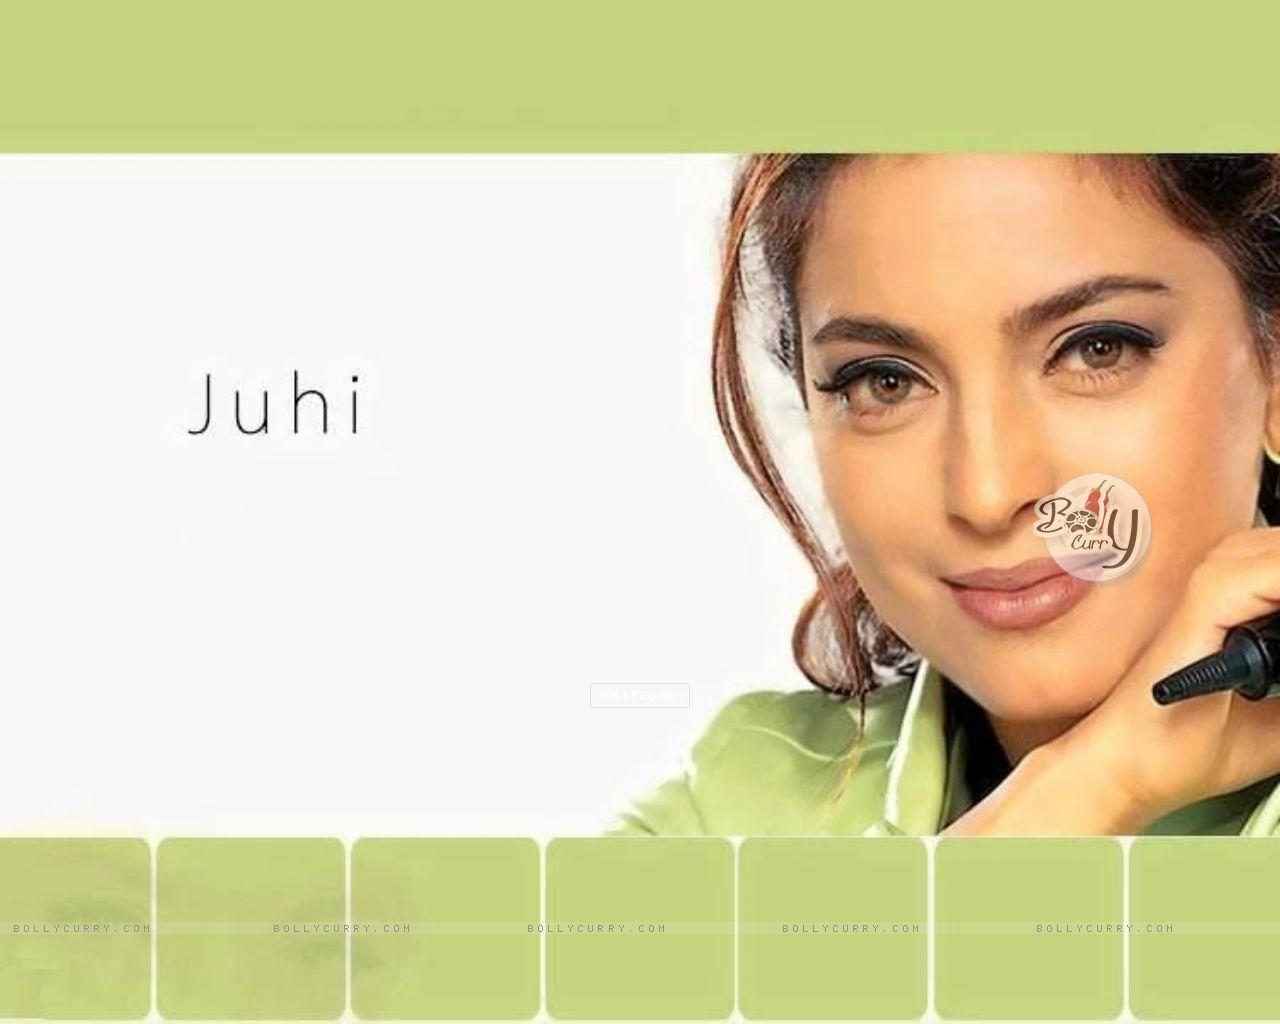 Juhi Chawla